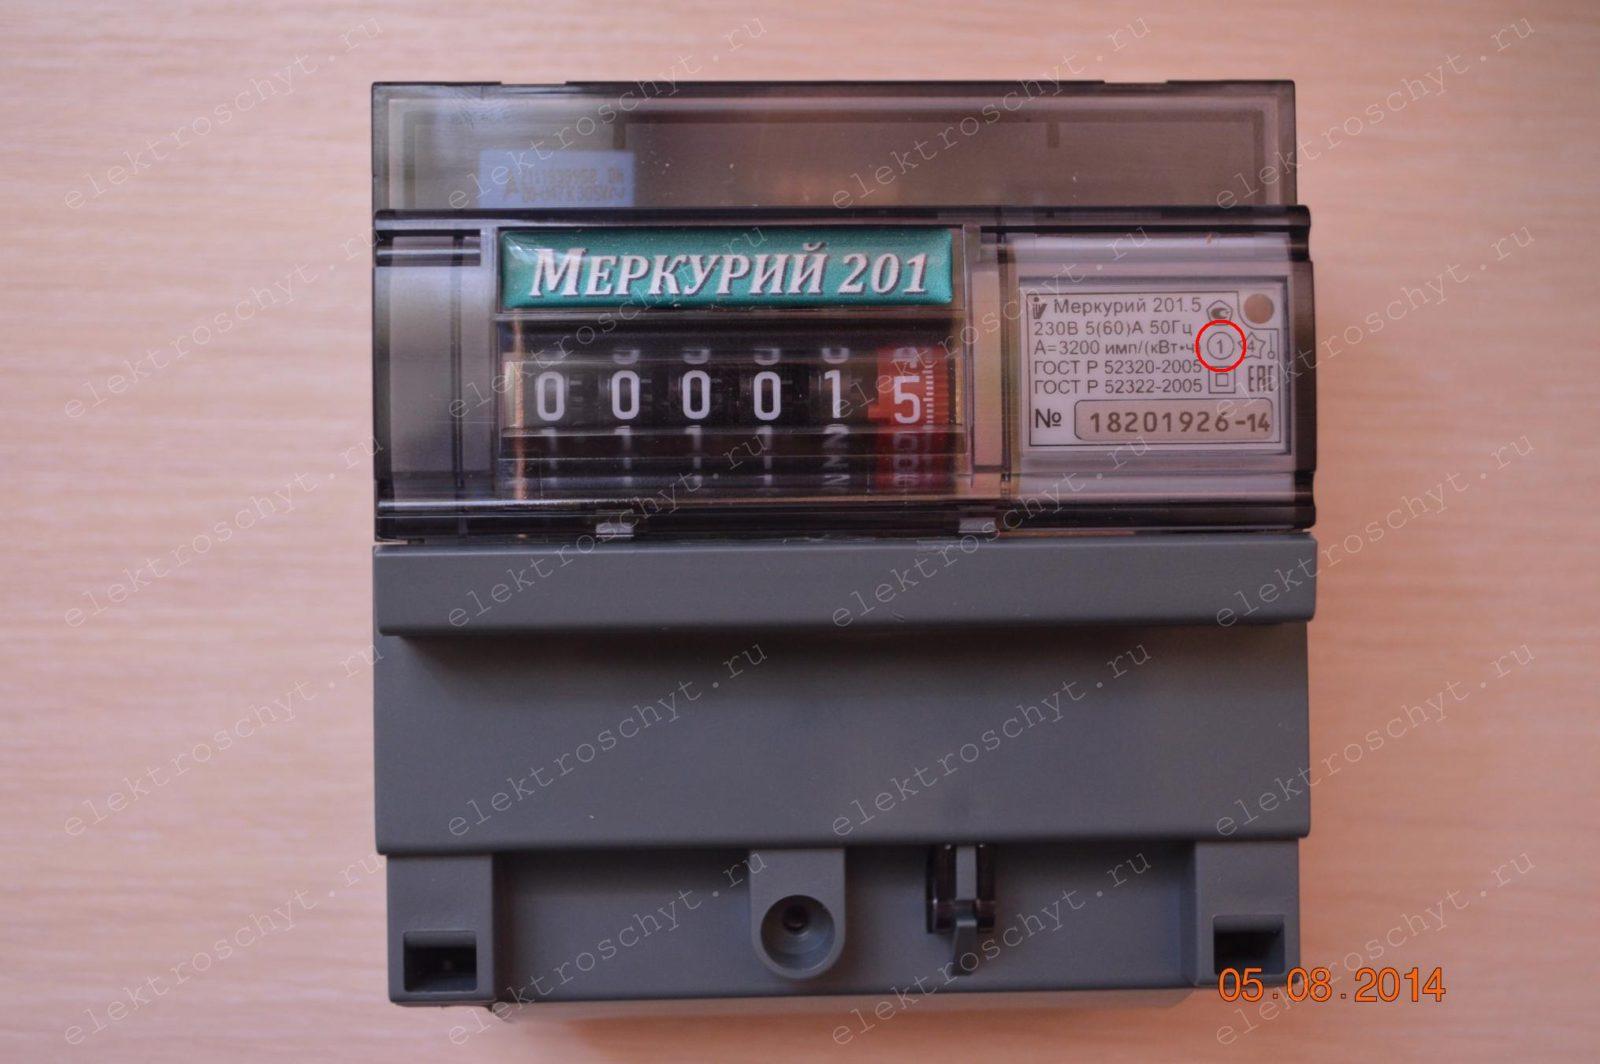 Схема подключения счетчики меркурий 201